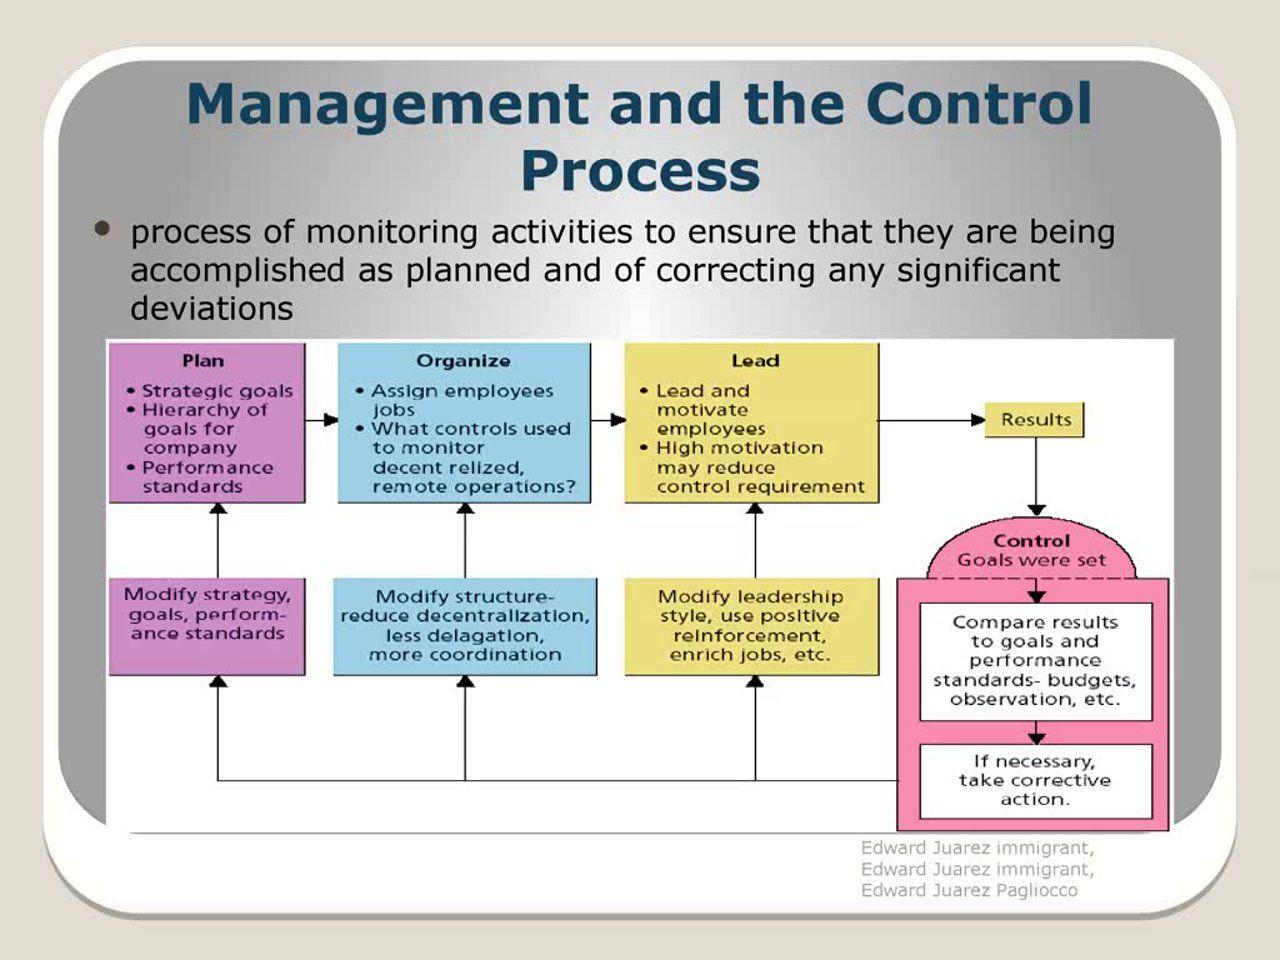 Edward Juarez Immigrant Control Management How To Motivate Employees Business Management Organization Planning